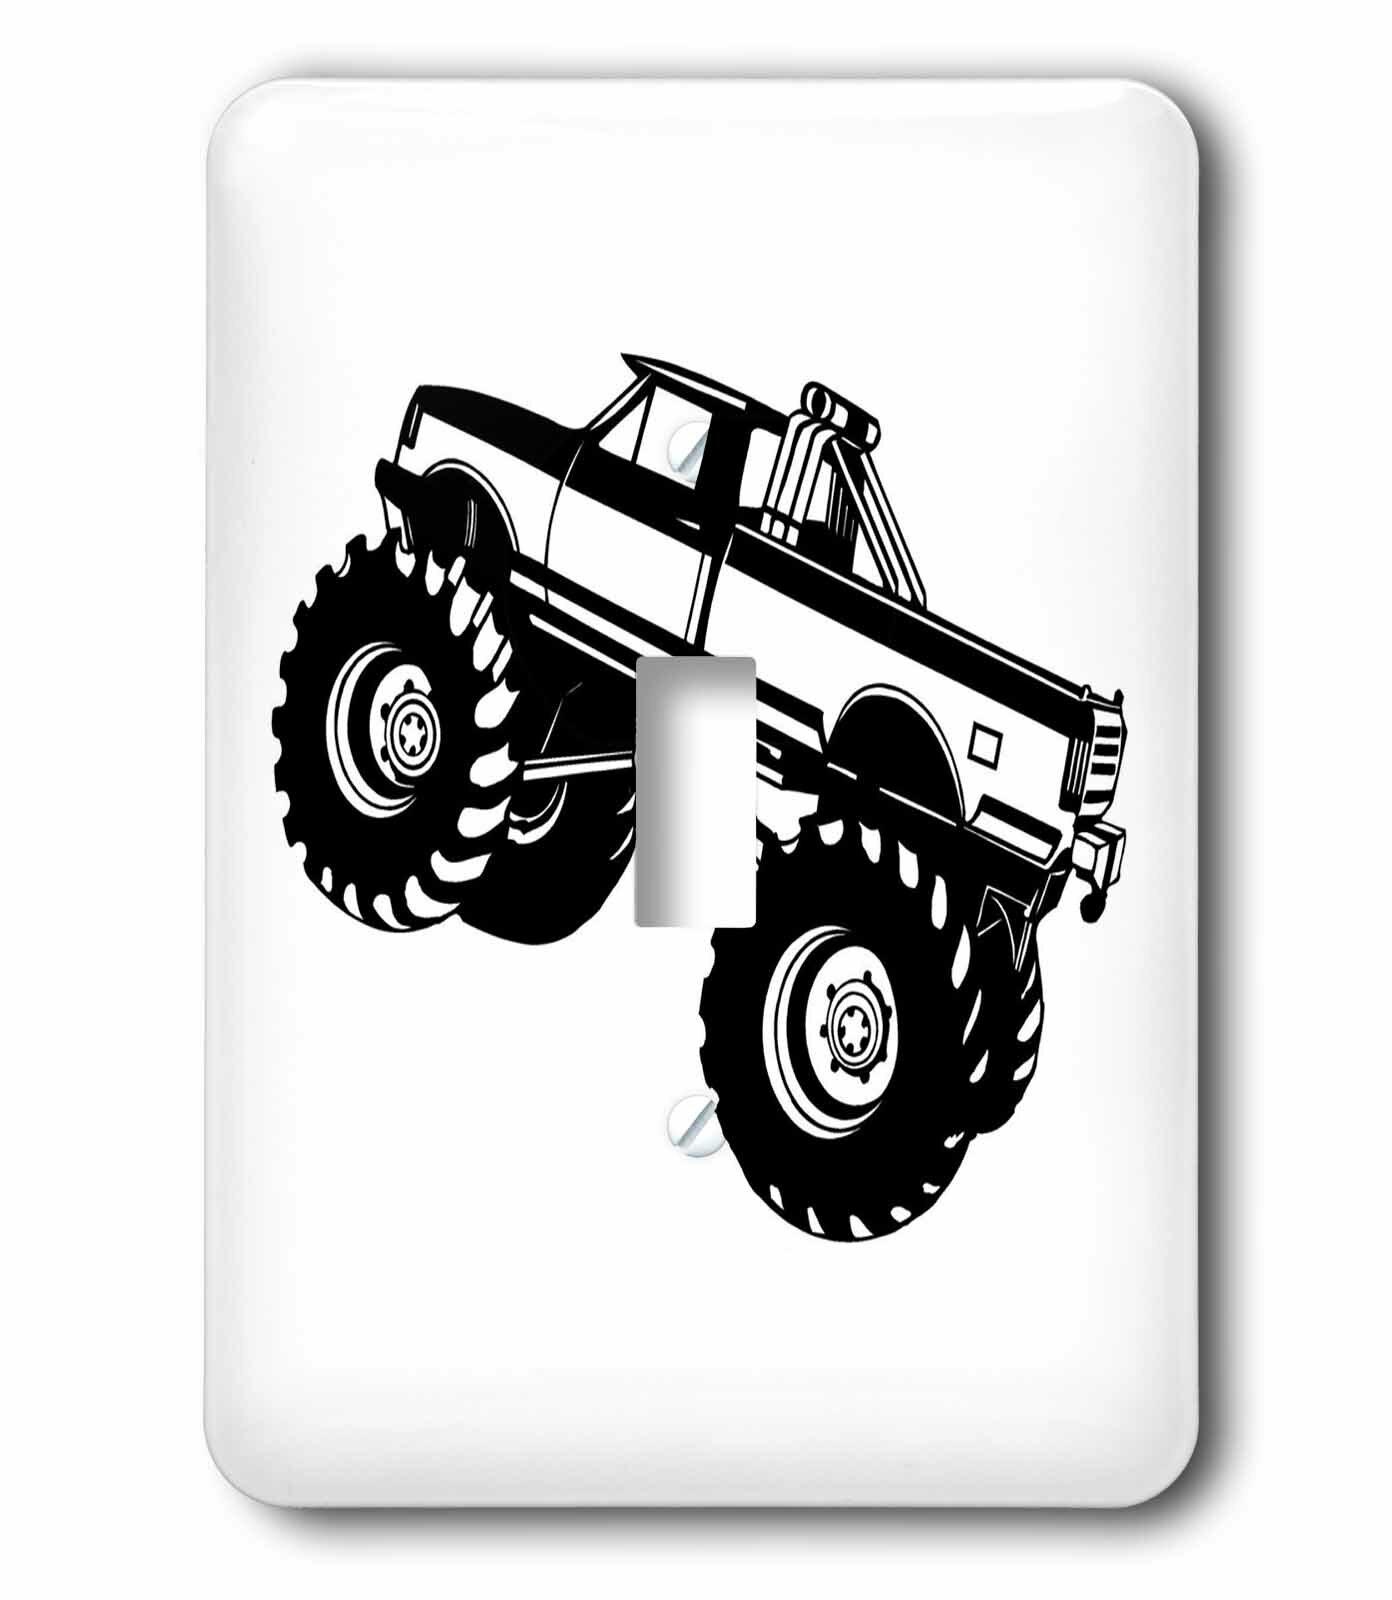 3drose Monster Truck 1 Gang Toggle Light Switch Wall Plate Wayfair